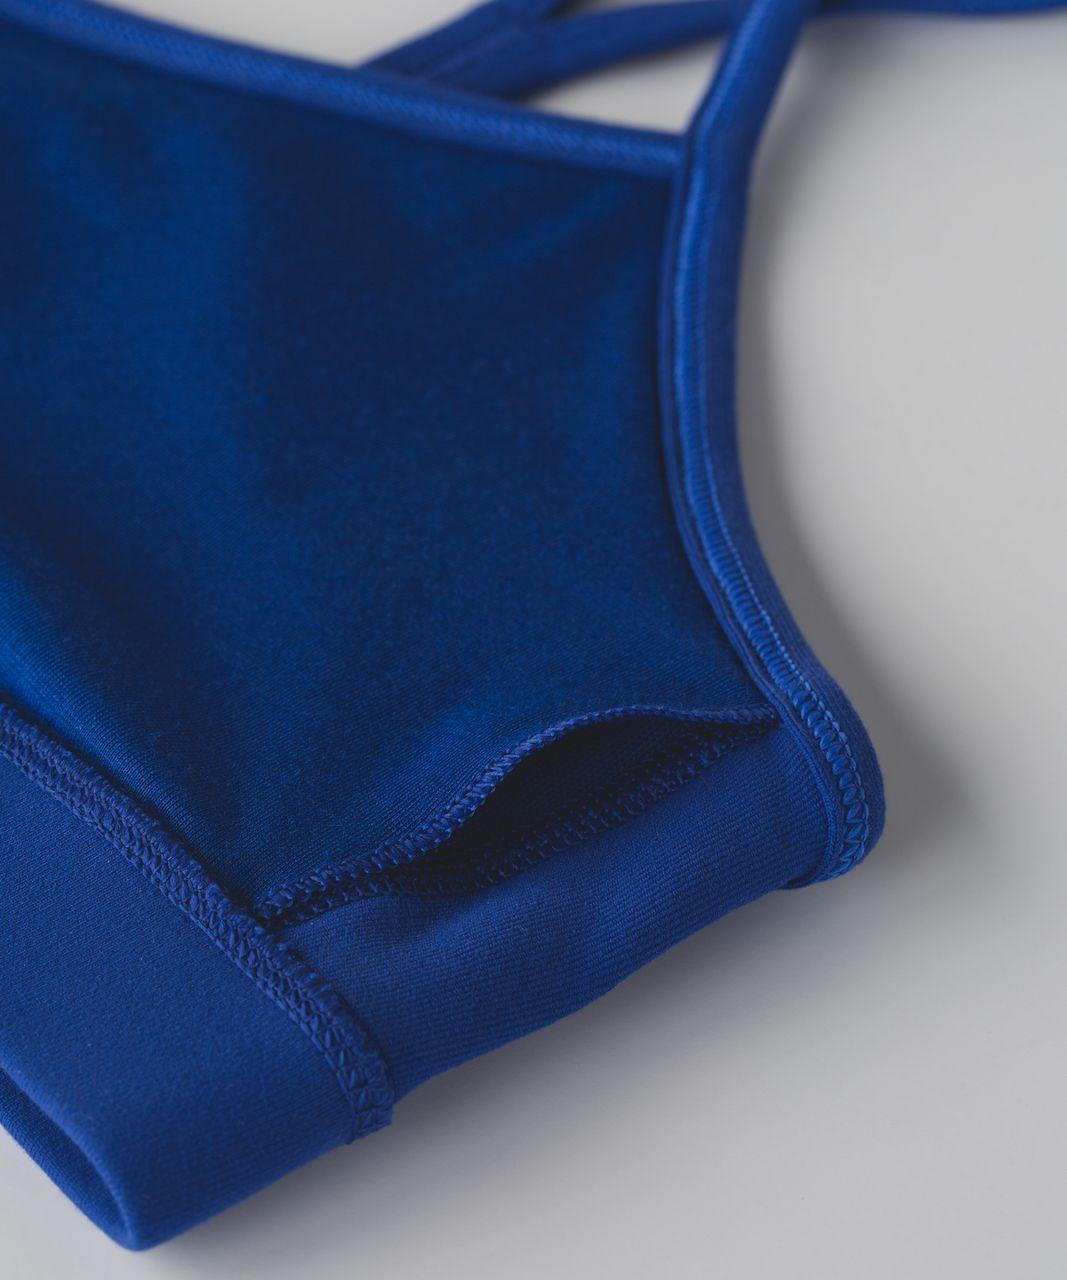 Lululemon Flow Y Bra IV - Sapphire Blue